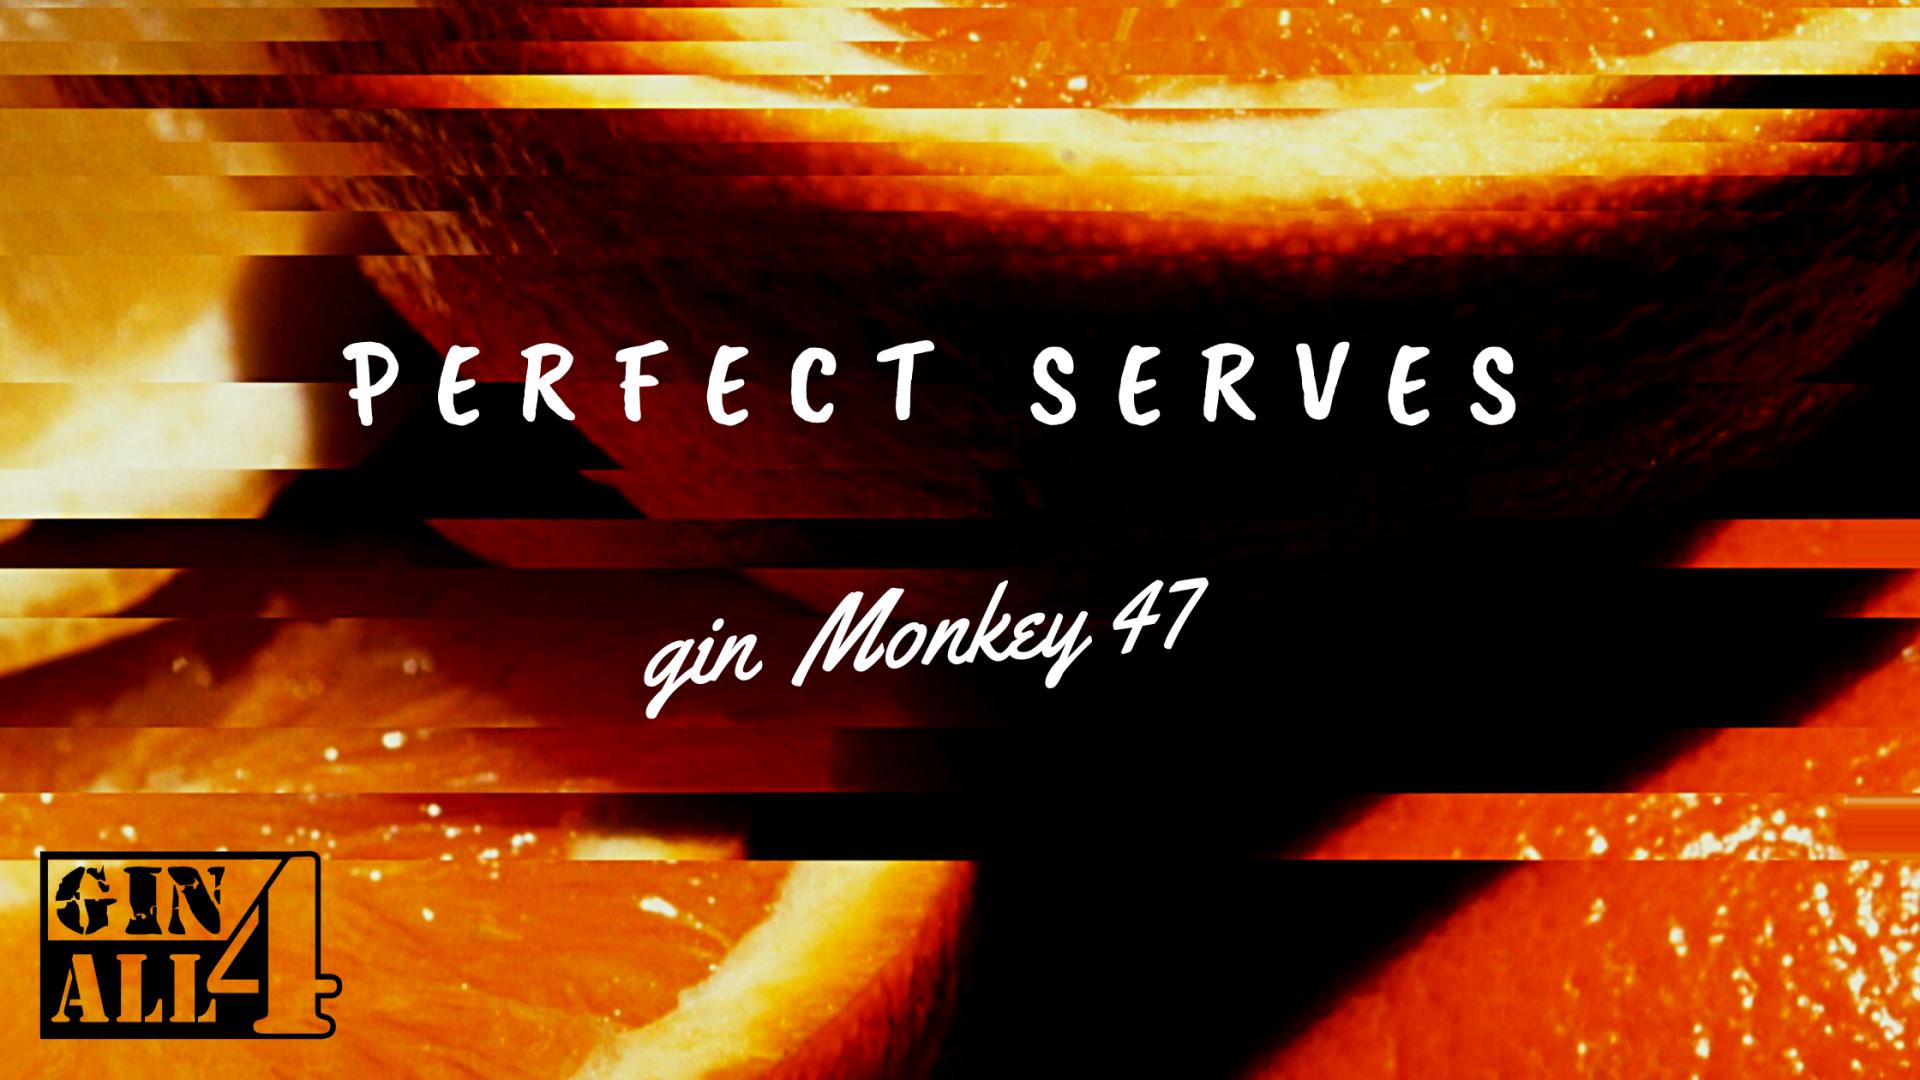 Perfect Serves - GIN MONKEY 47